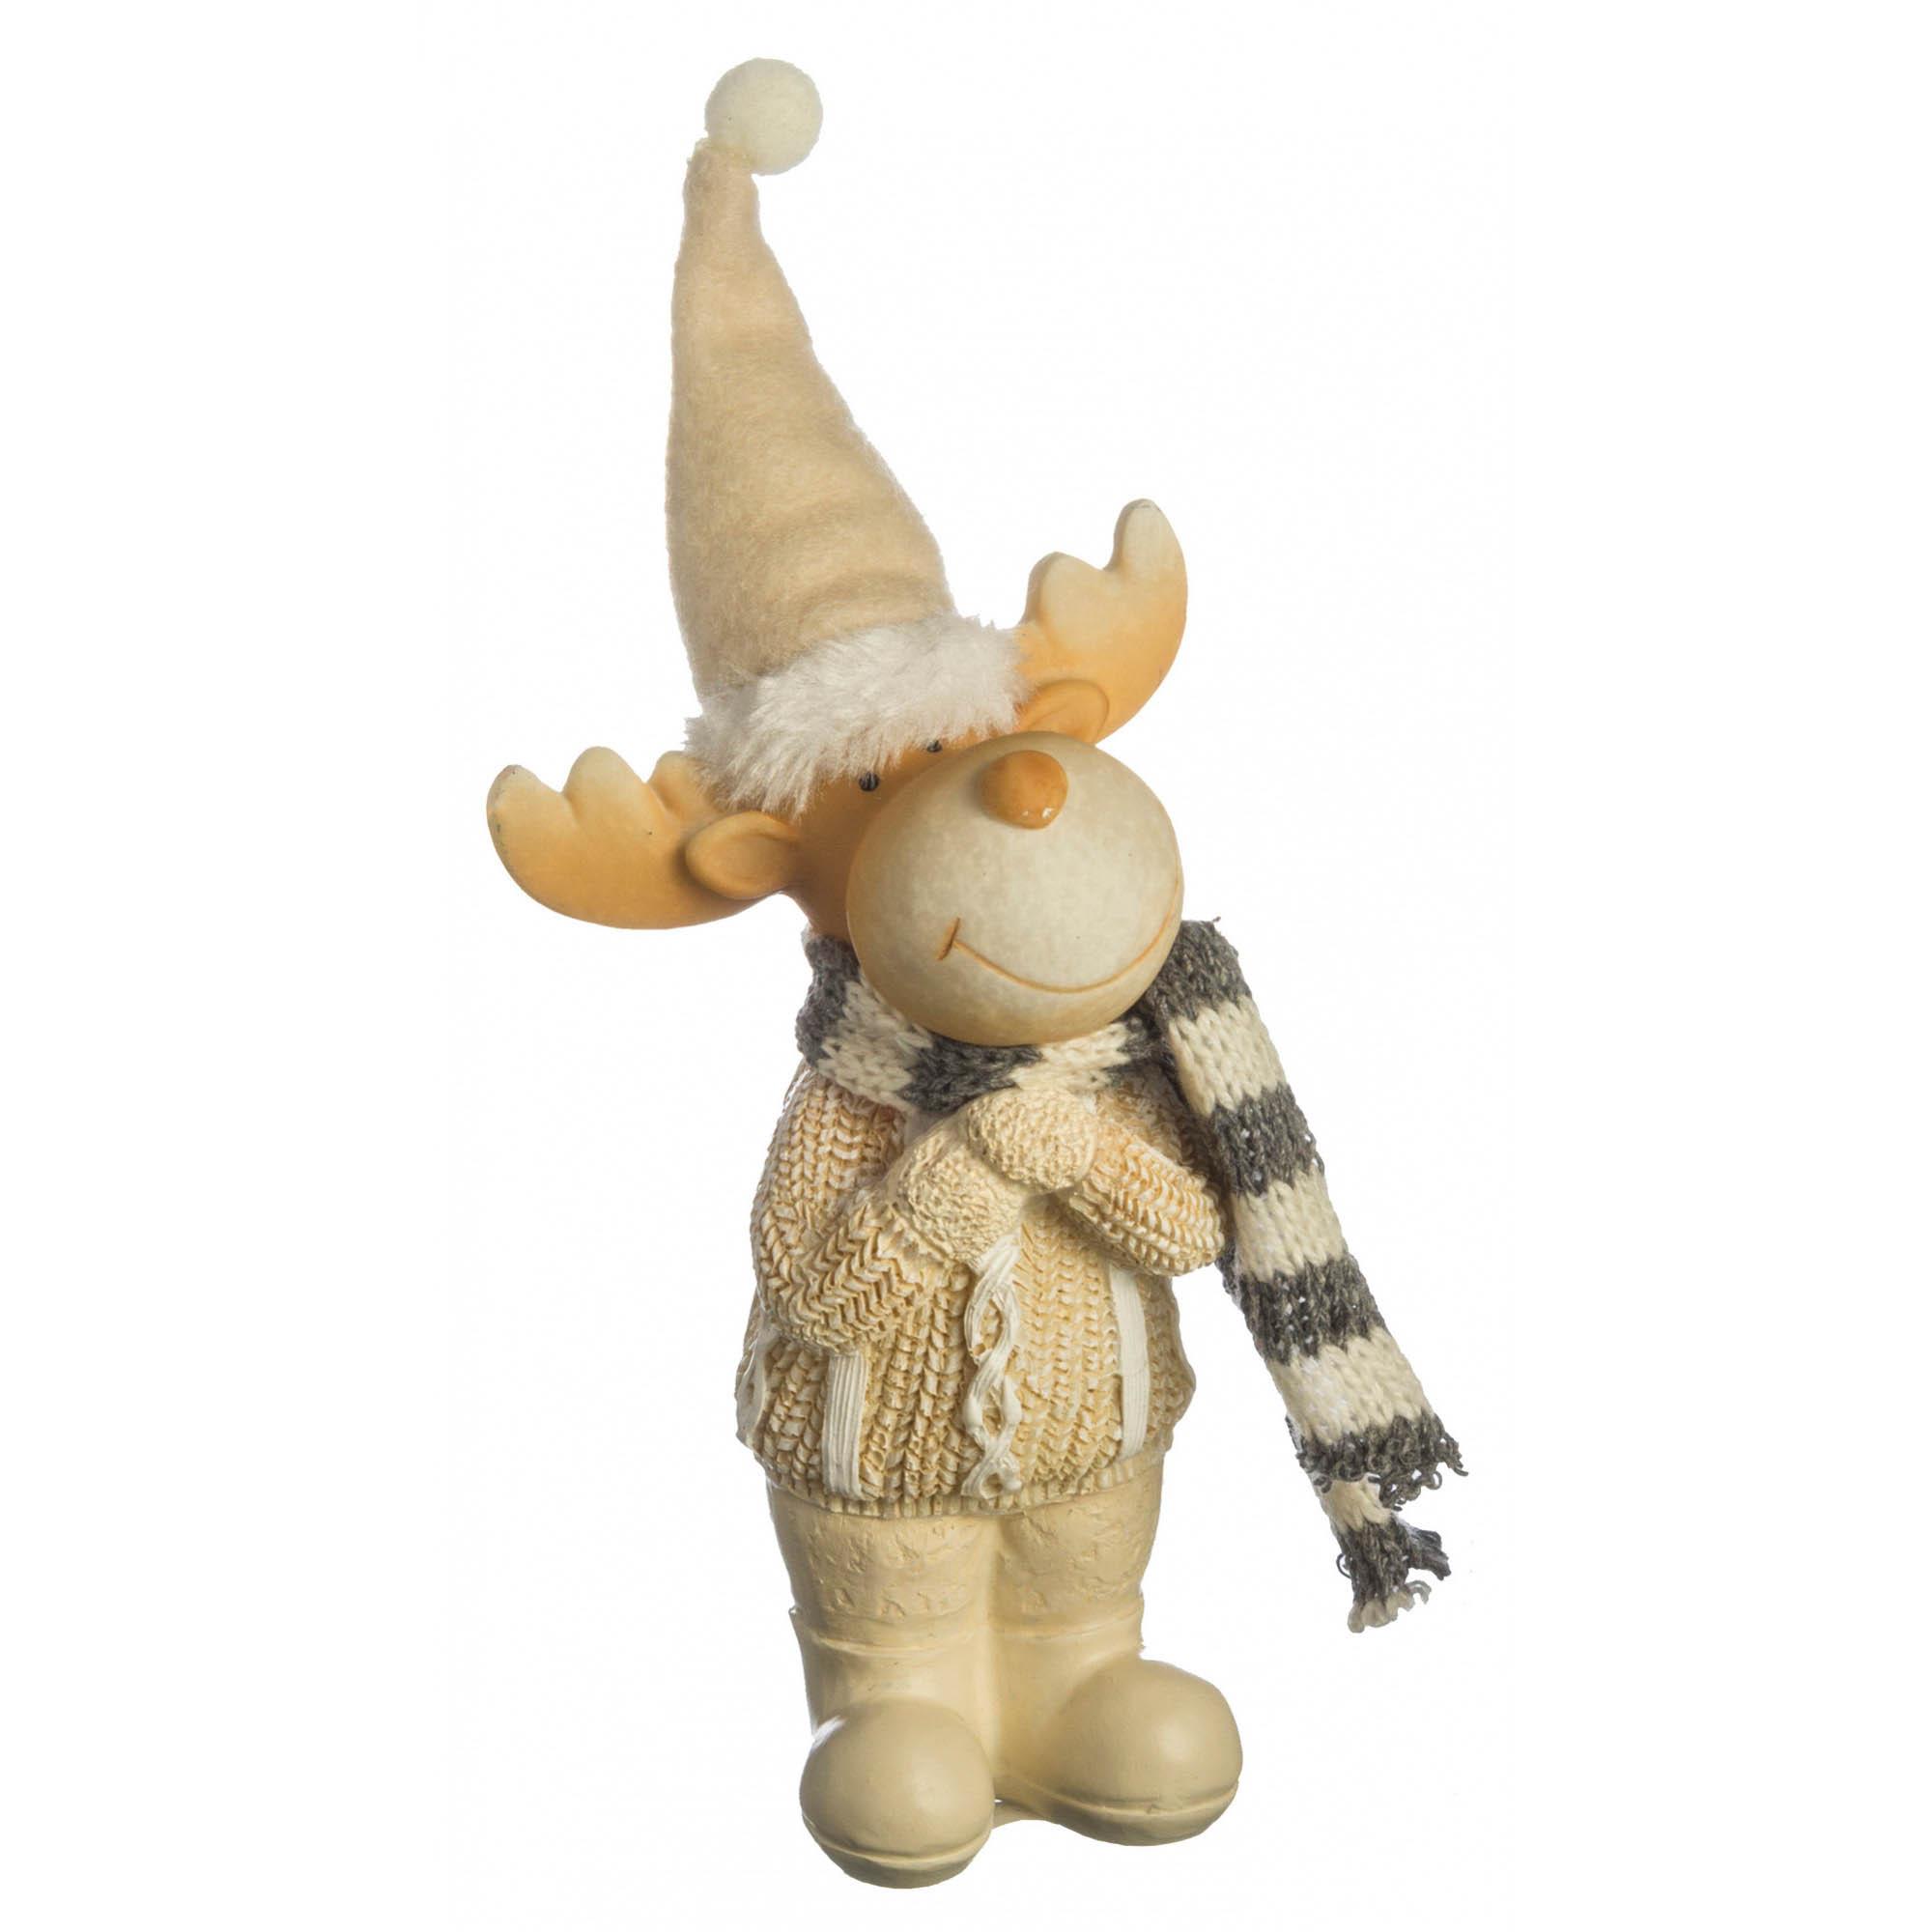 {} Lefard Интерьерная игрушка Лось (6х8х13 см) lefard интерьерная игрушка jan 5х6х13 см